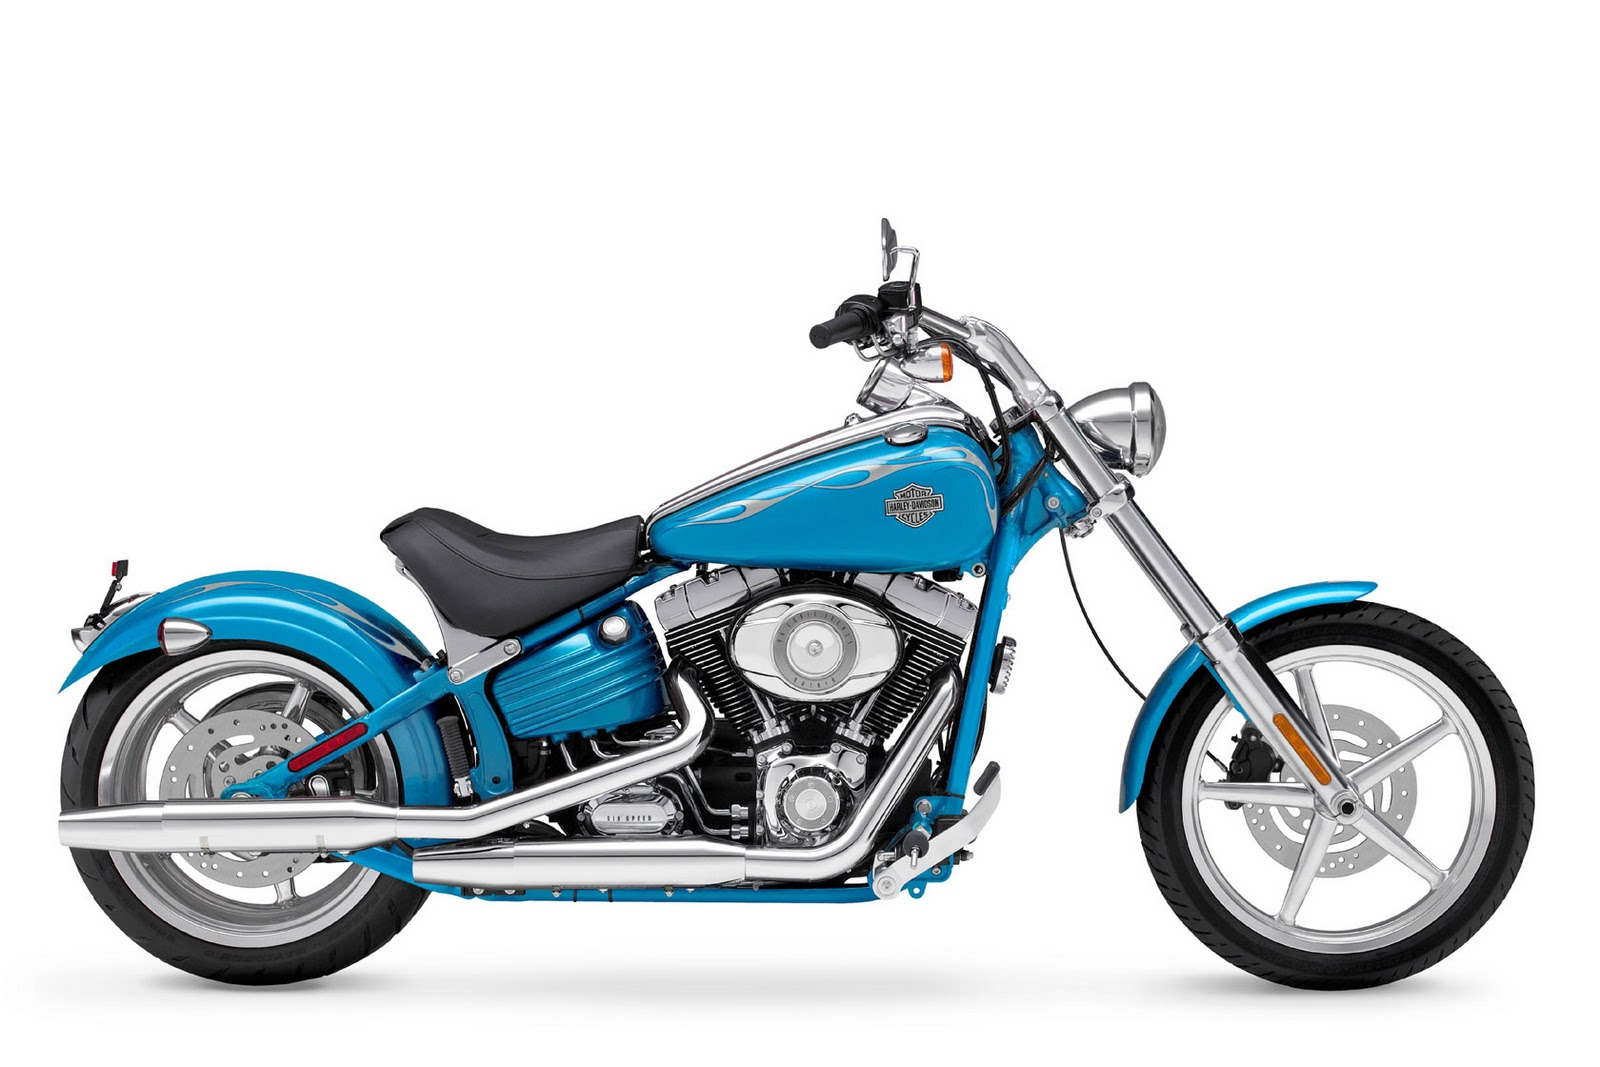 Harley Davidson Harley Davidson Fxcwc Rocker C 2011